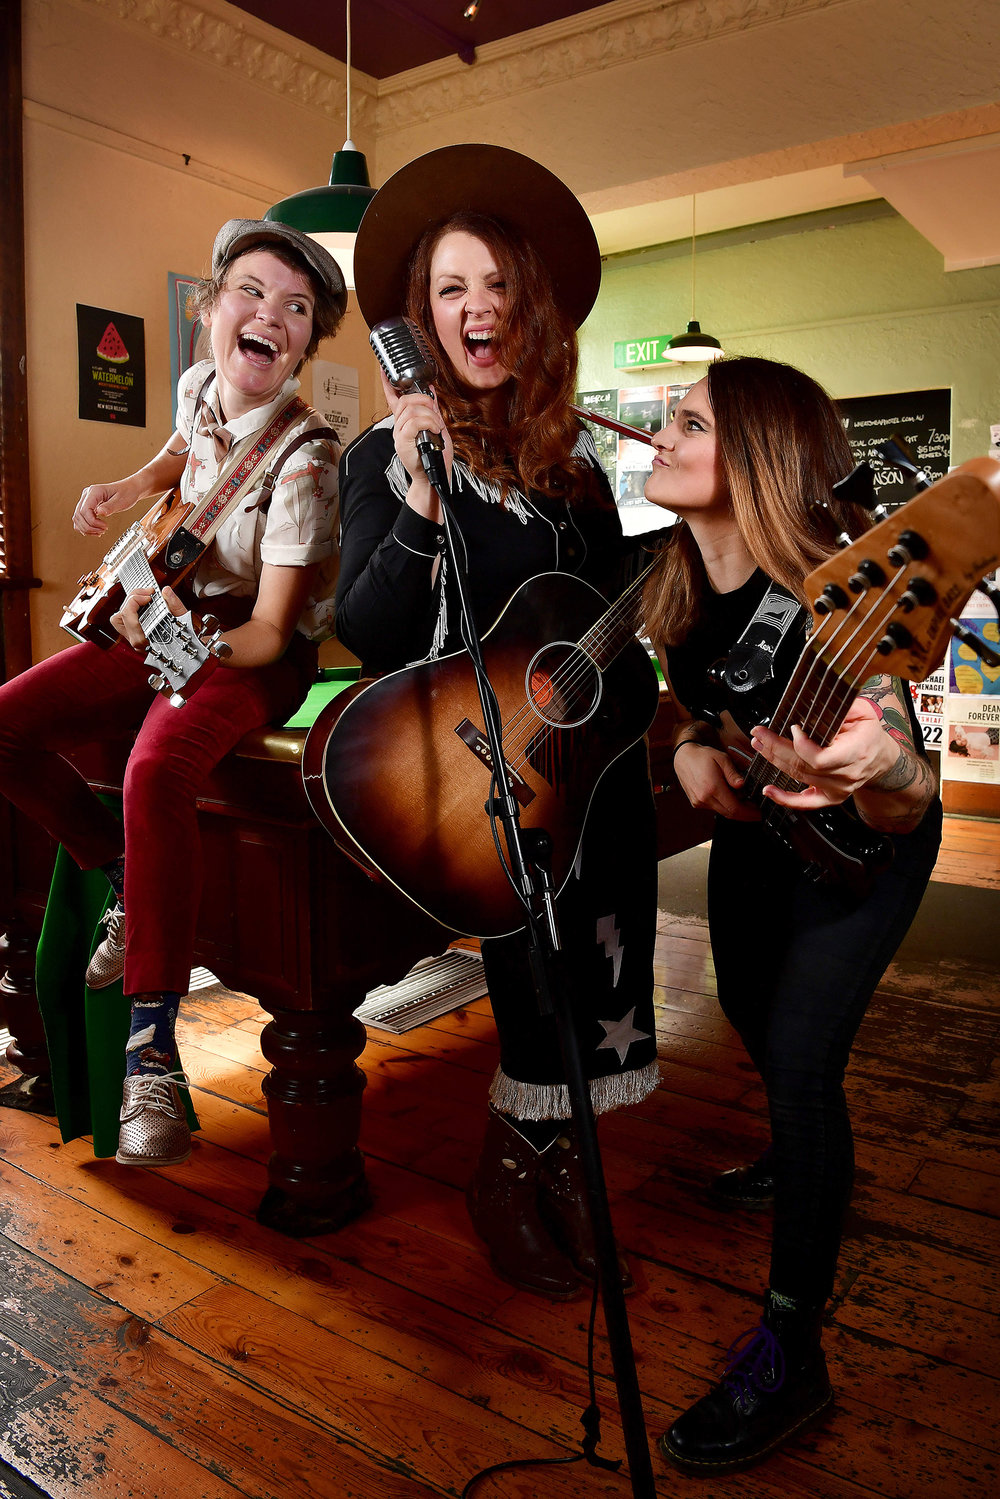 CHP_Export_174512367_Guitarists-singers-song writers Kelly Menhennett  Hana Brenecki & Annie Siegman.jpg